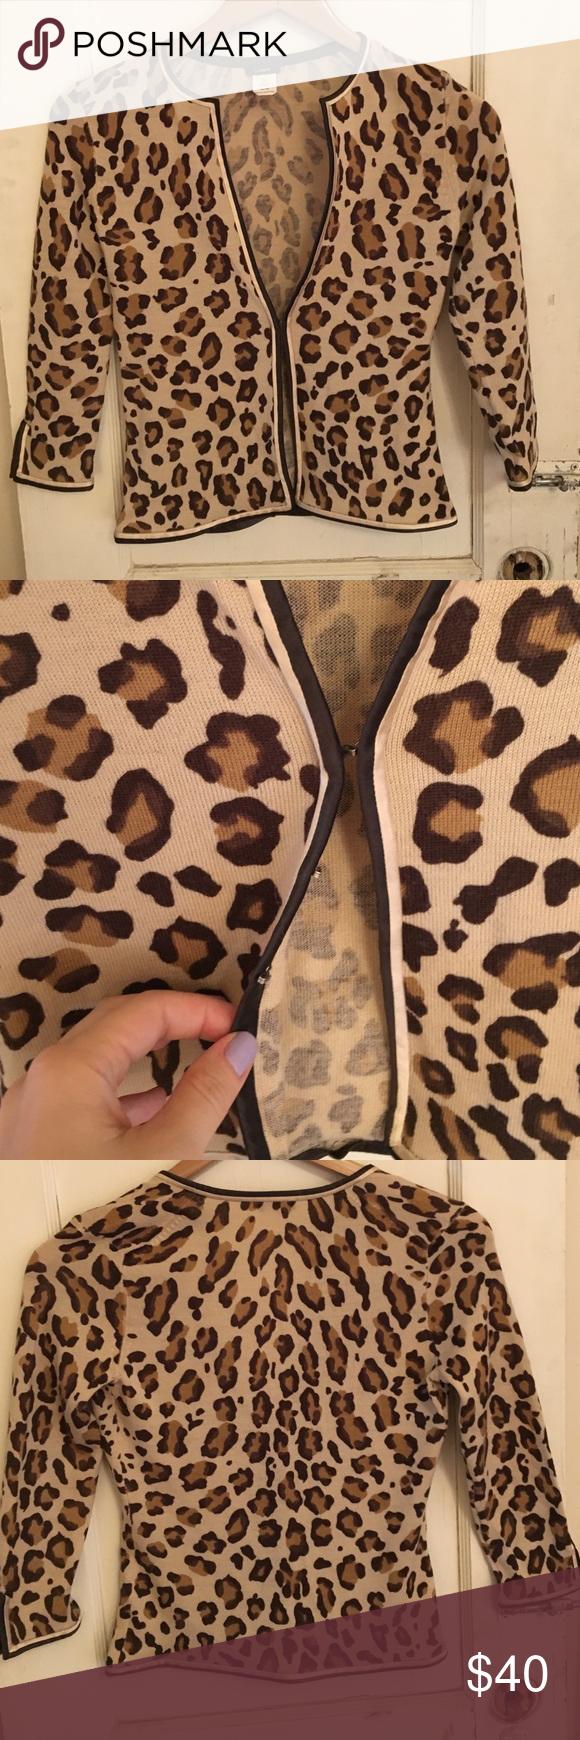 "Leopard cardi Jcrew cardi I am reposhing because it's too small sadly but I love it such a great leopard print, L 20"" B 15"" 100% wool NO TRADES J. Crew Sweaters Cardigans"